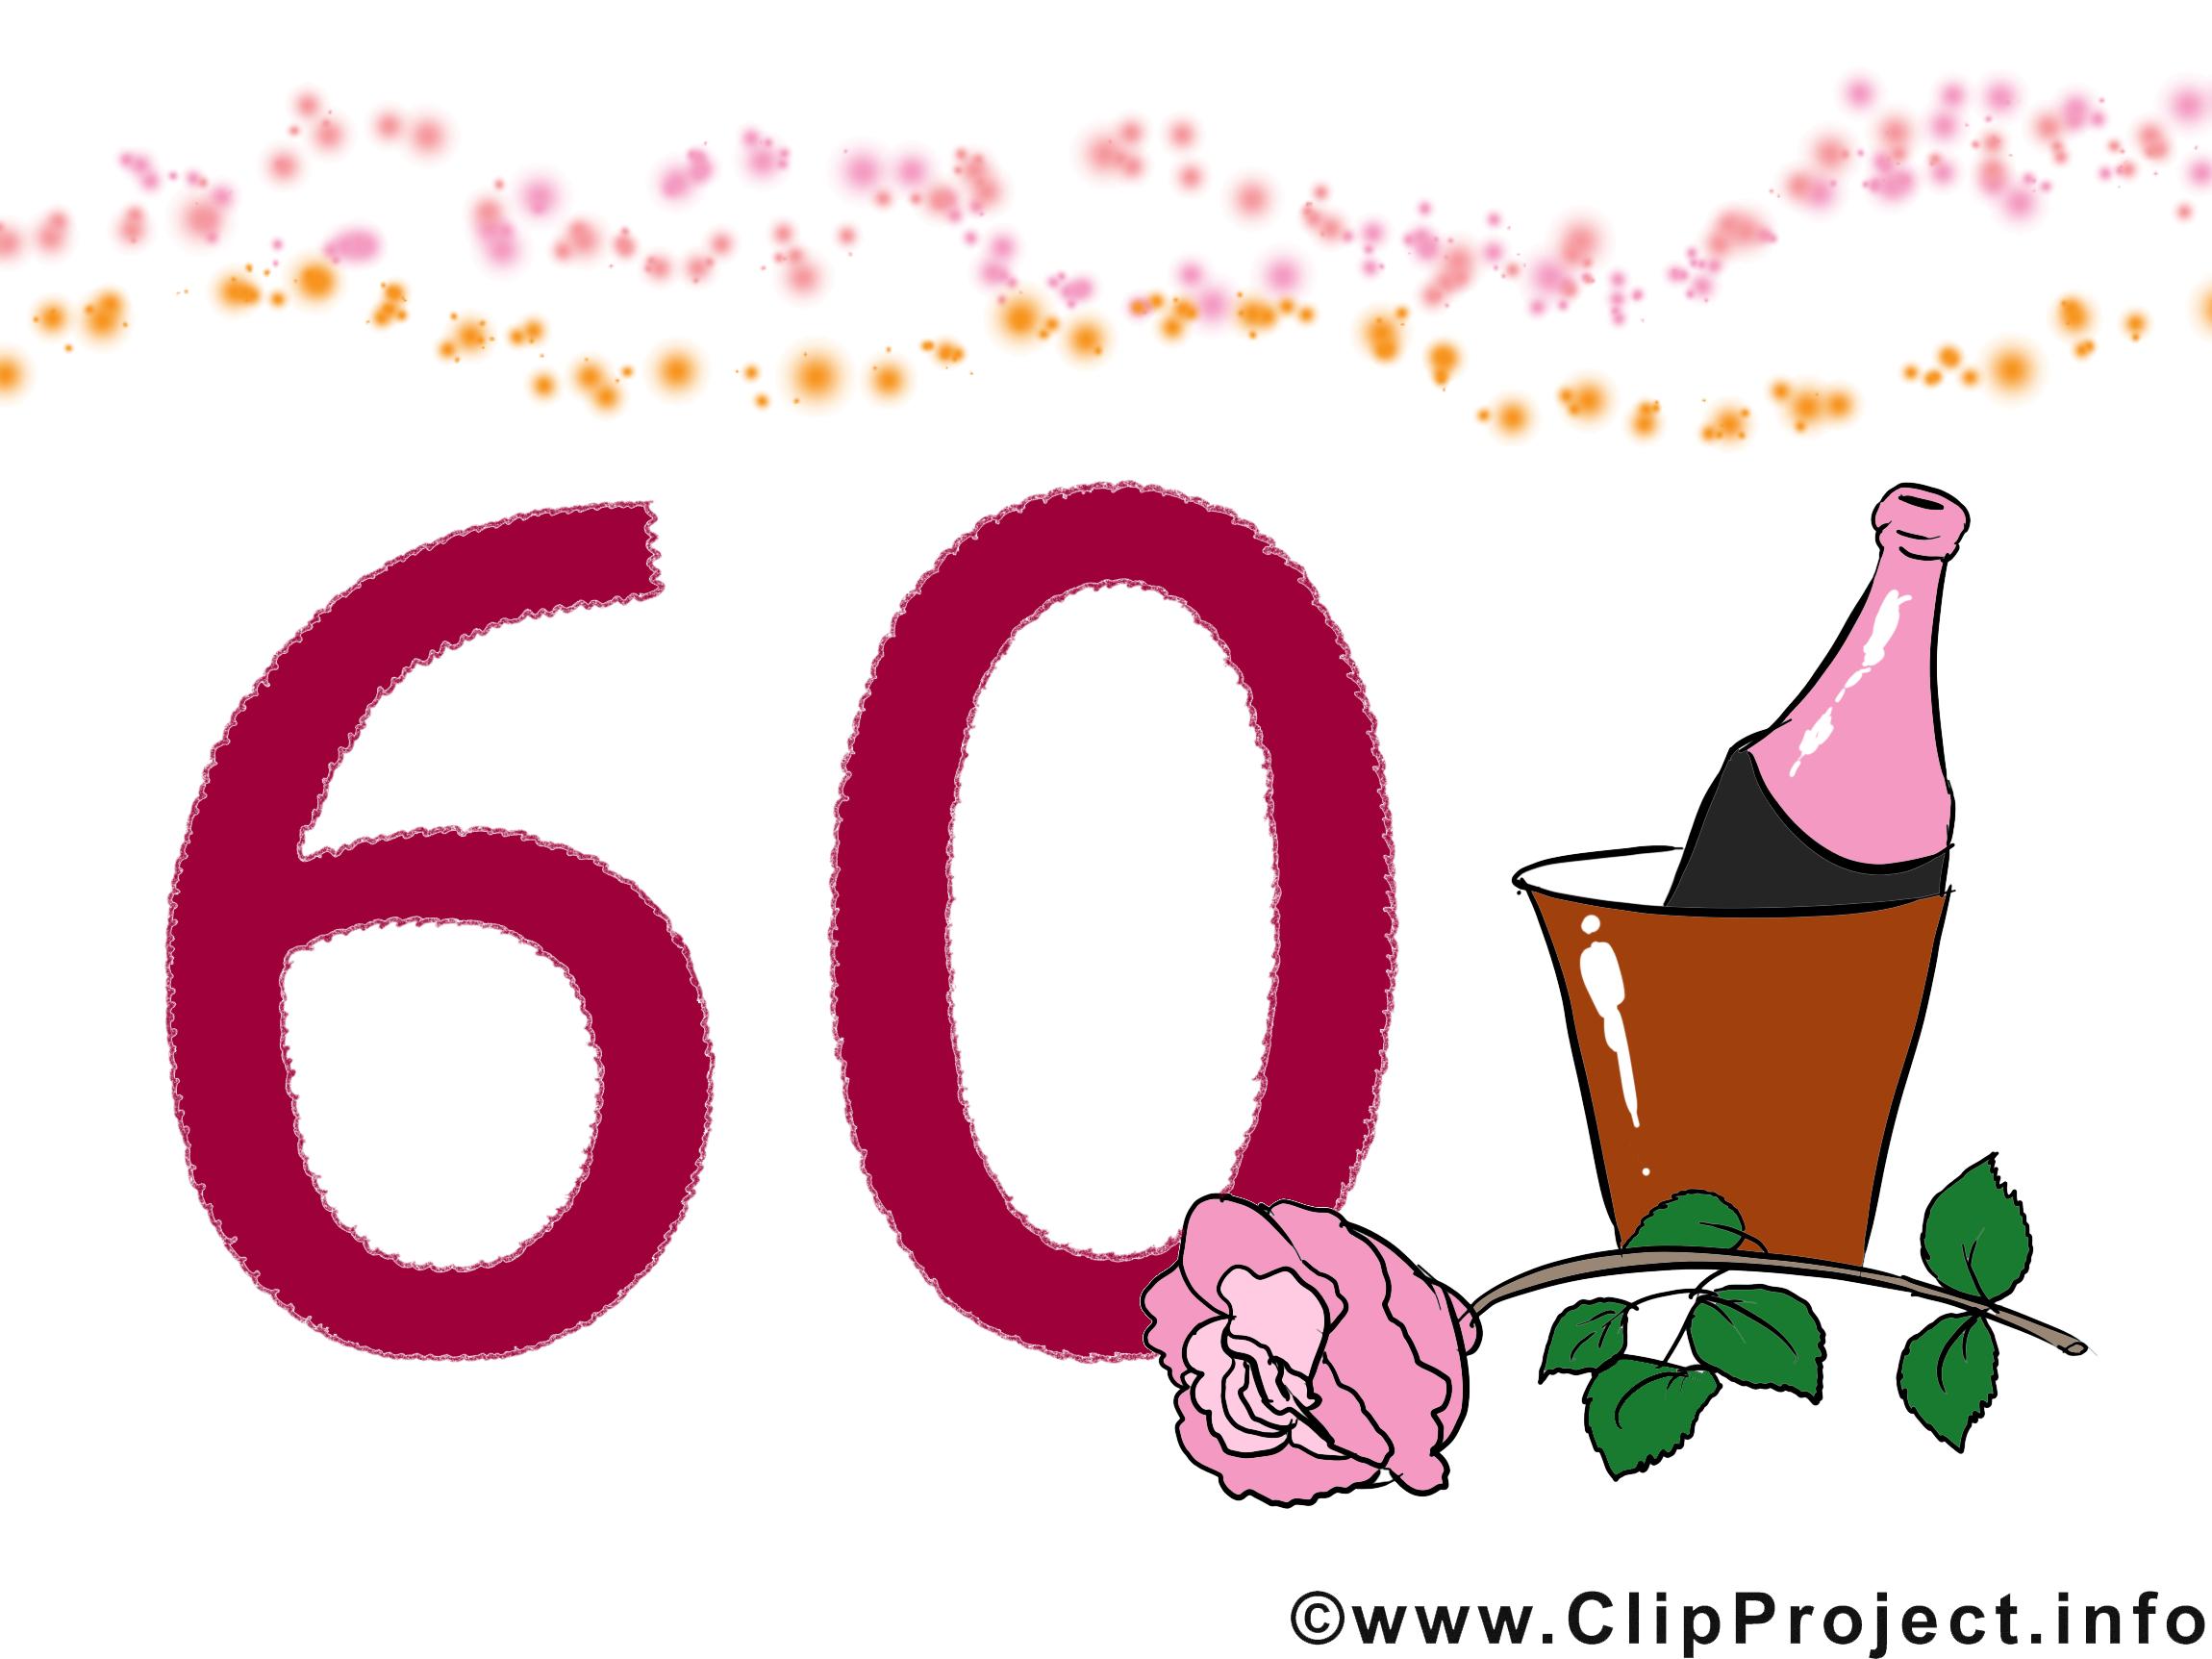 Clipart einladung 60 geburtstag download Geburtstag Bilder, Cliparts, Cartoons, Grafiken, Illustrationen ... download